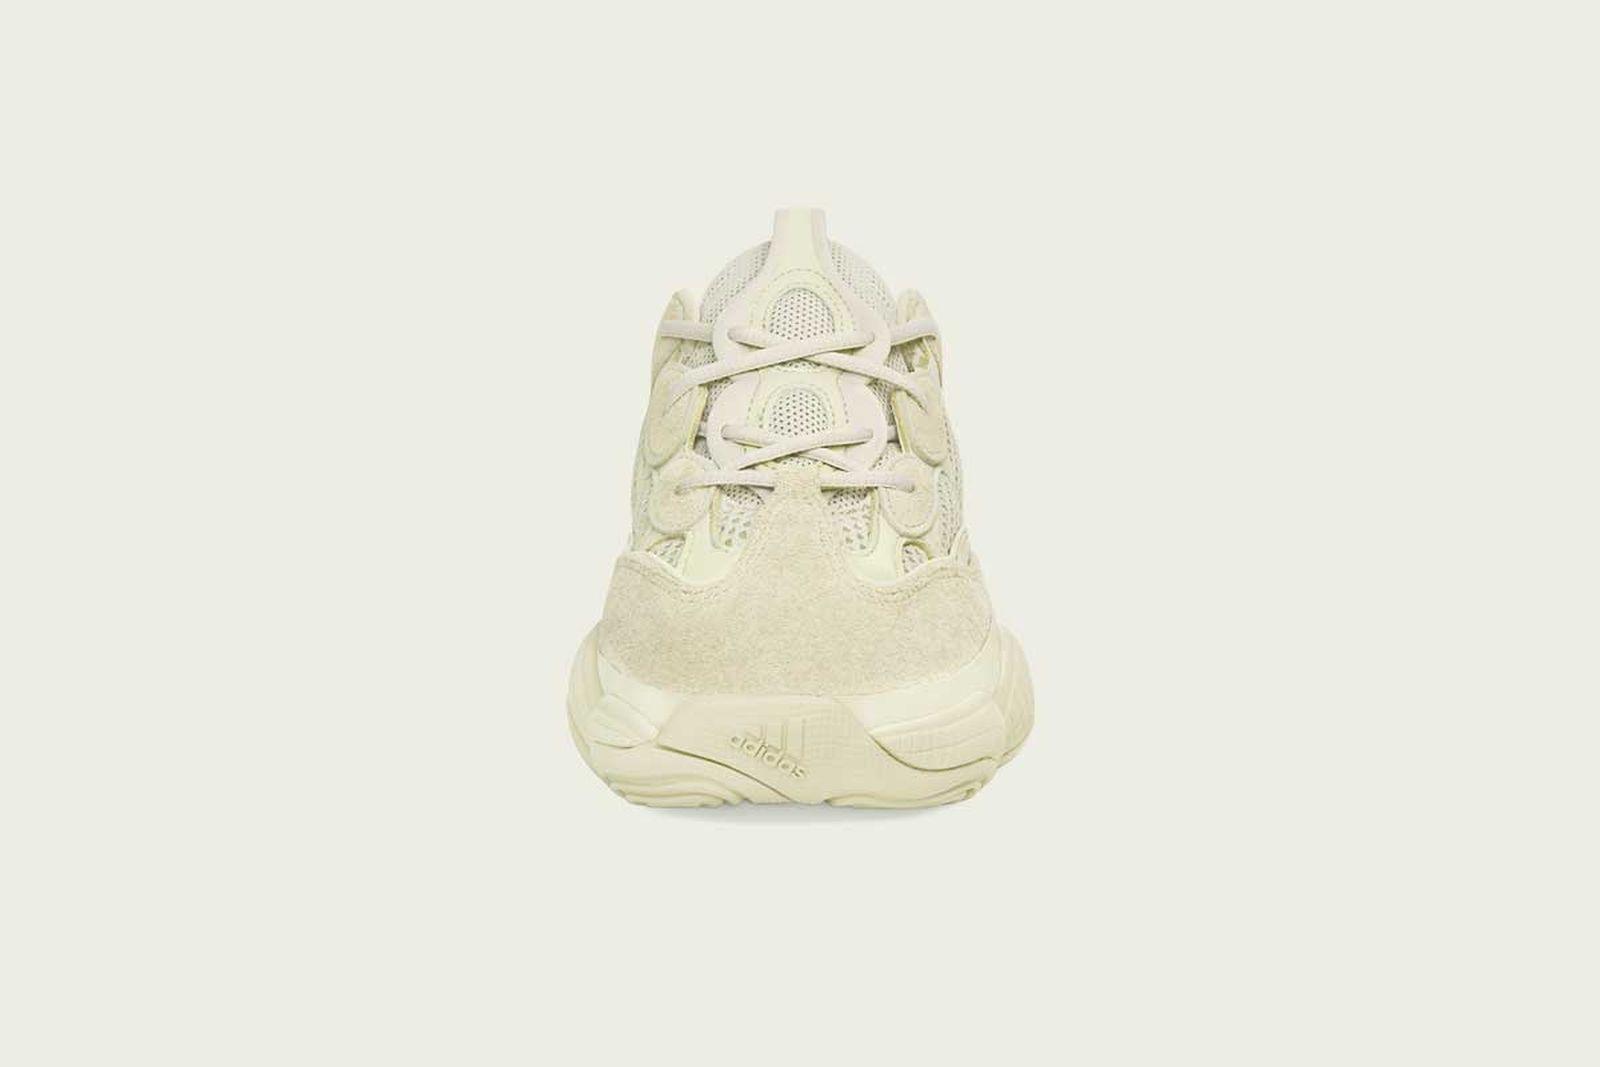 adidas yeezy 500 super moon yellow release date price adidas